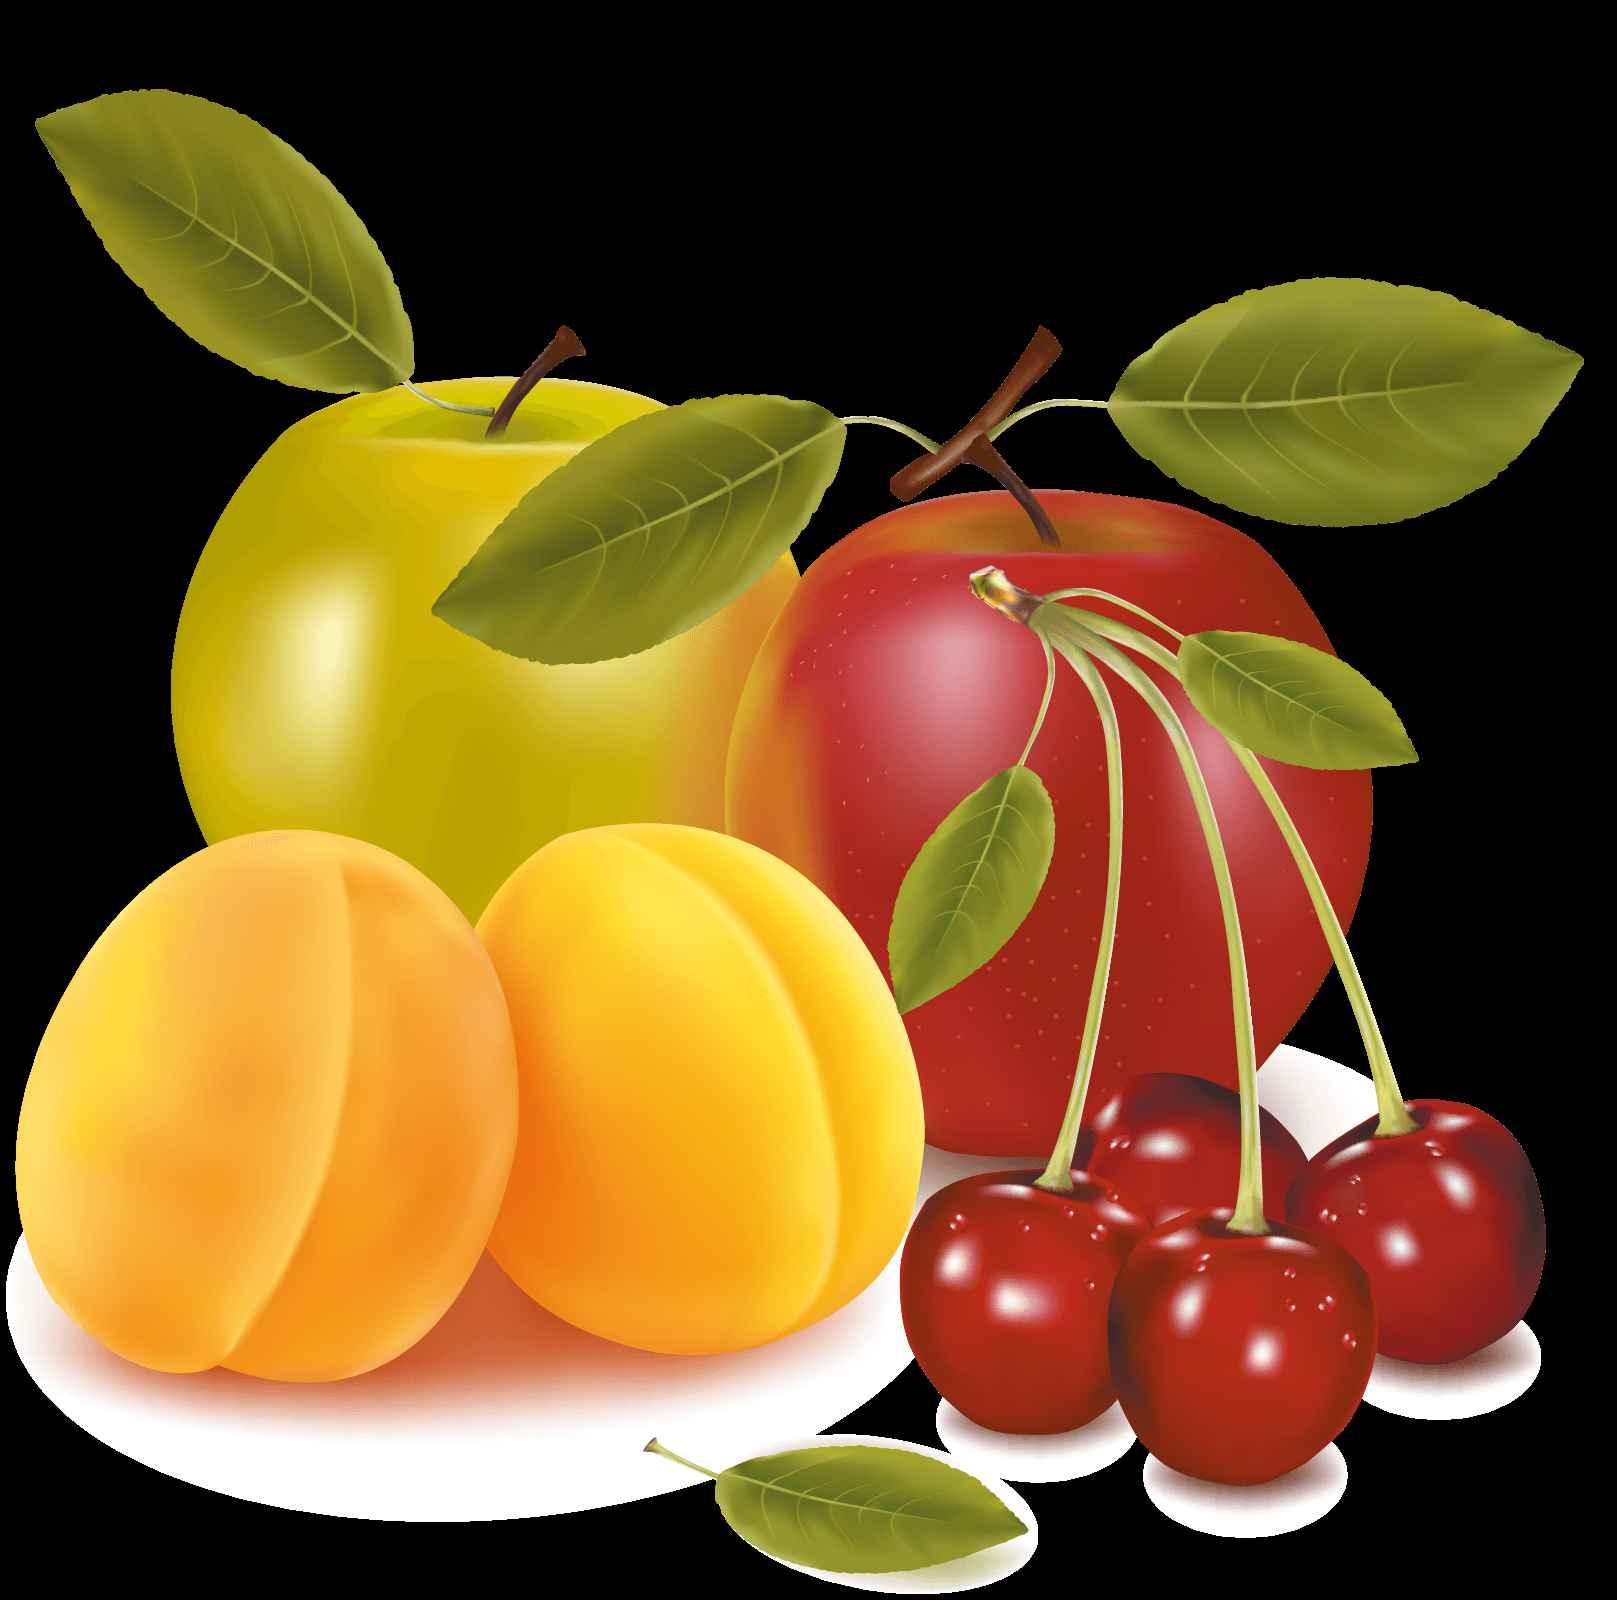 Cherry Apple Pear Vector Art png